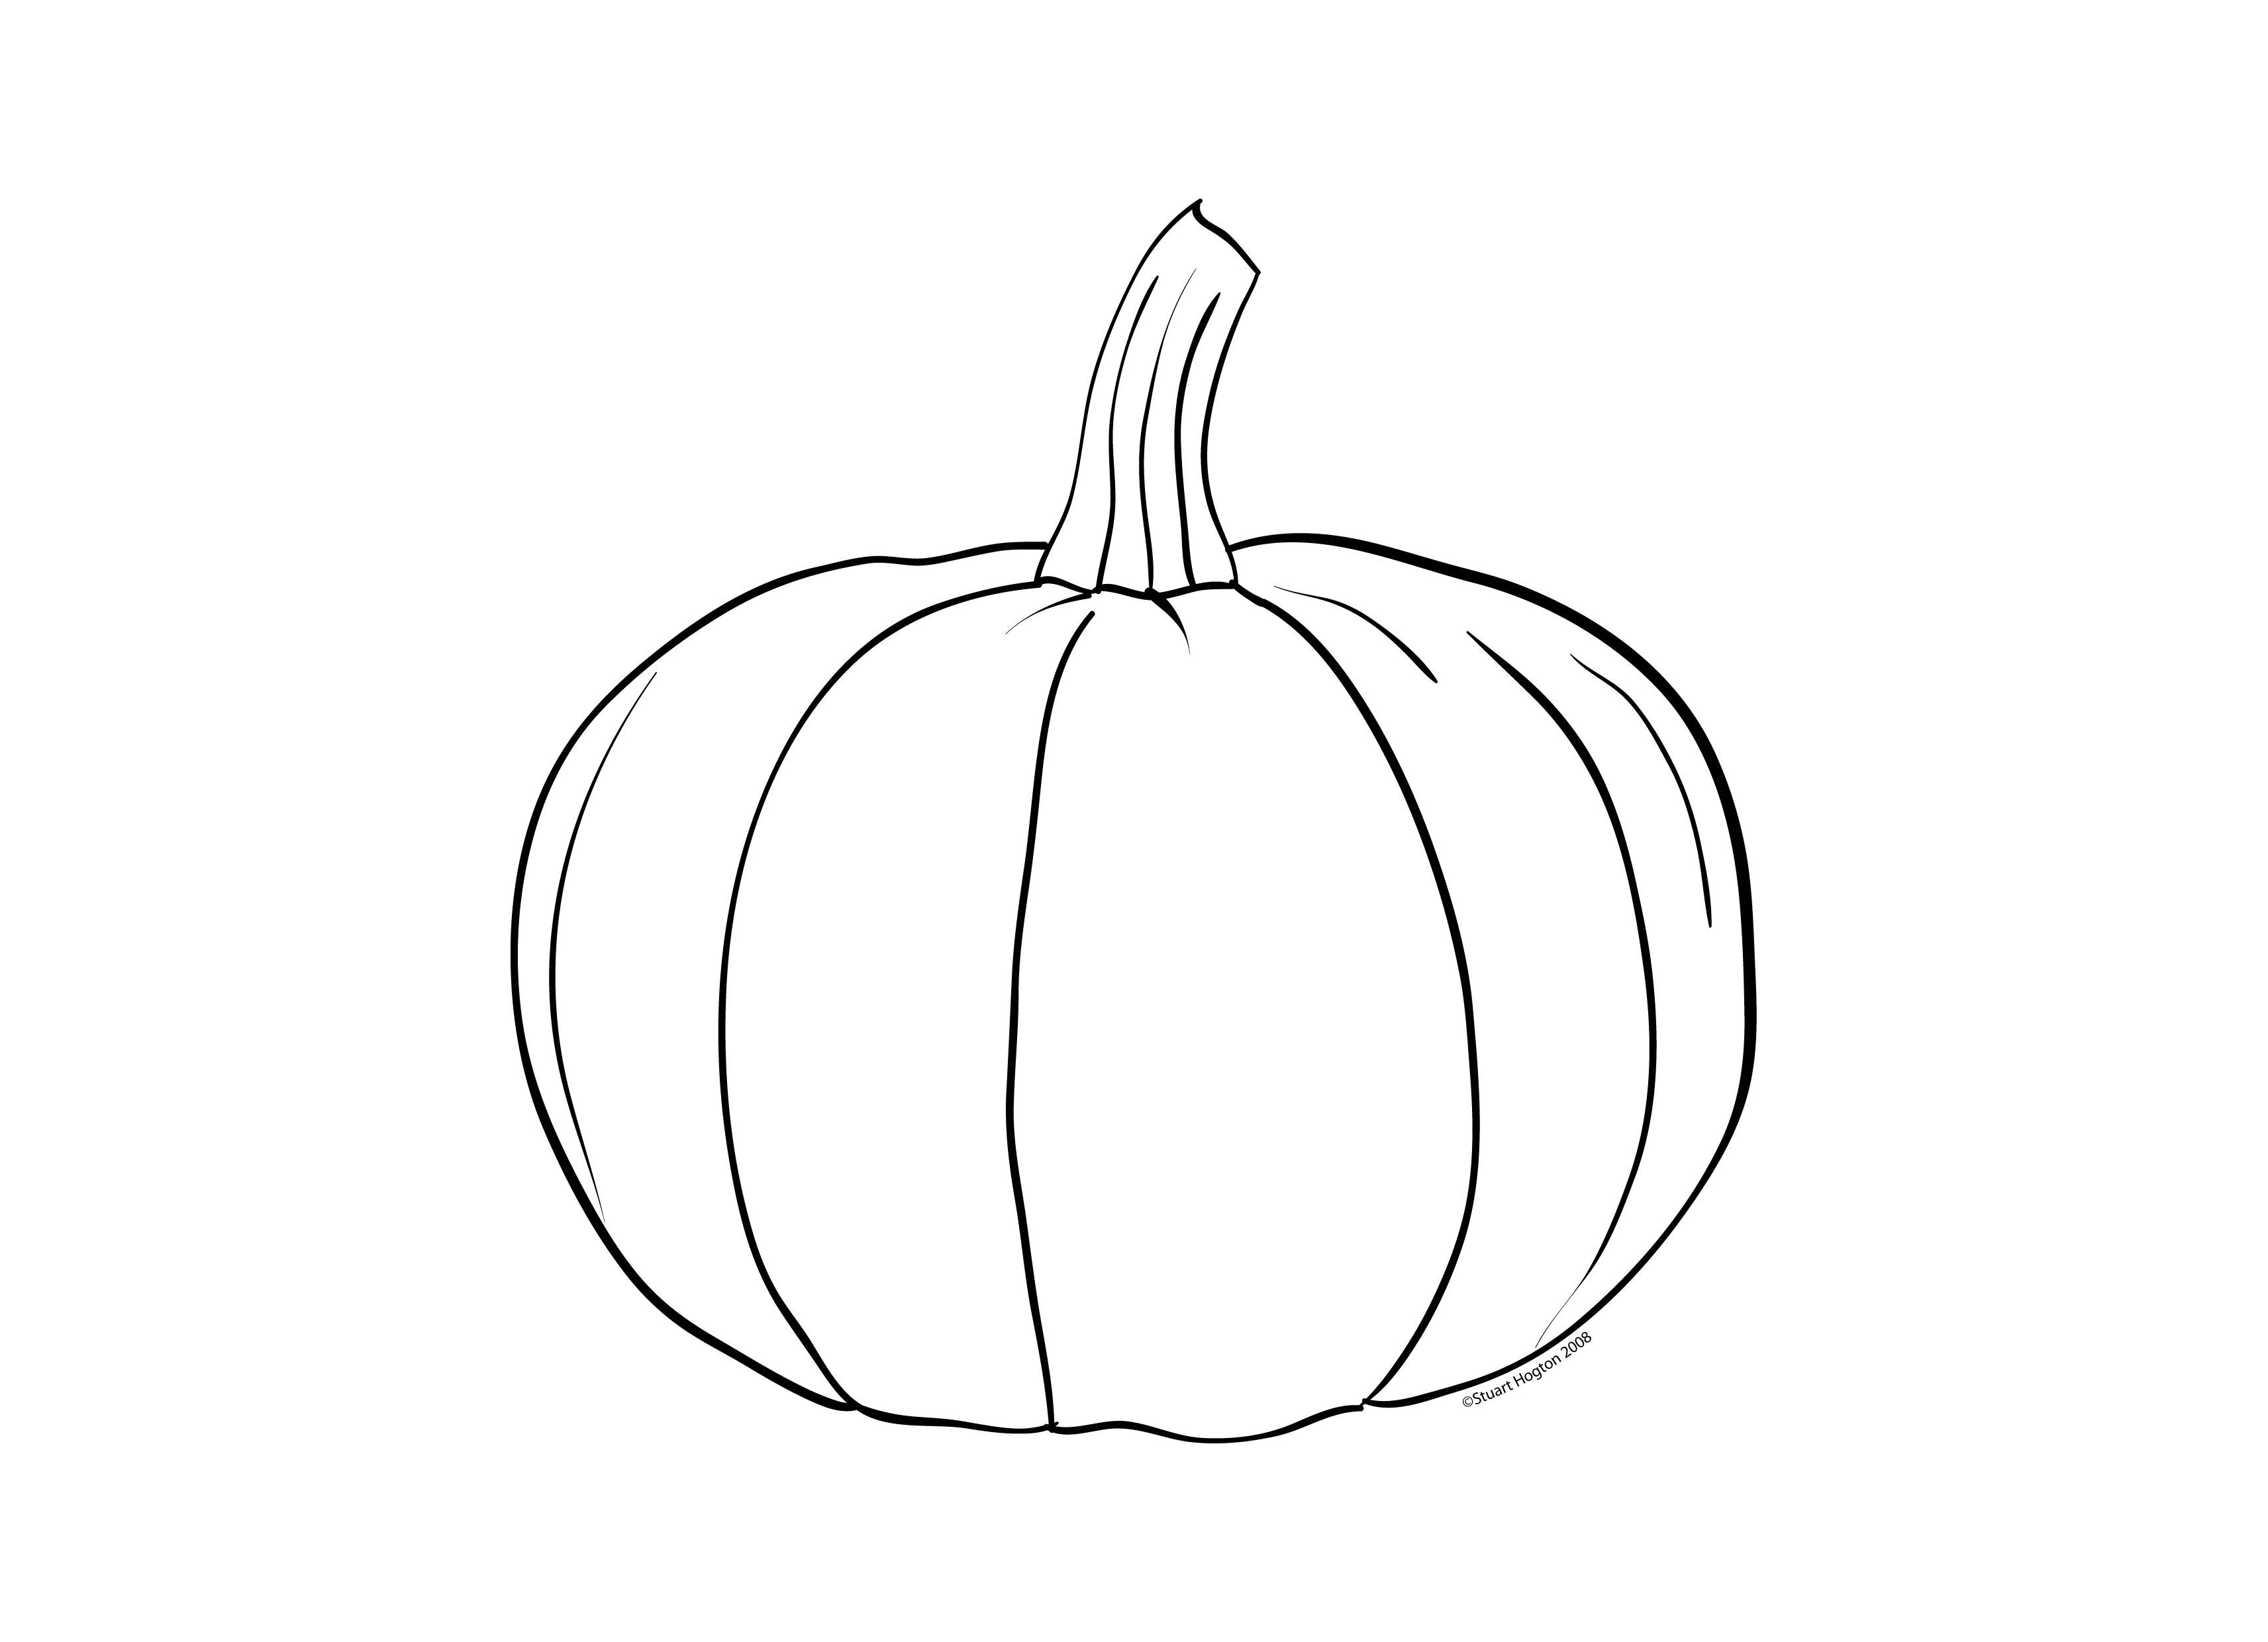 pumpkin sheets p is for pumpkin worksheet twisty noodle pumpkin sheets